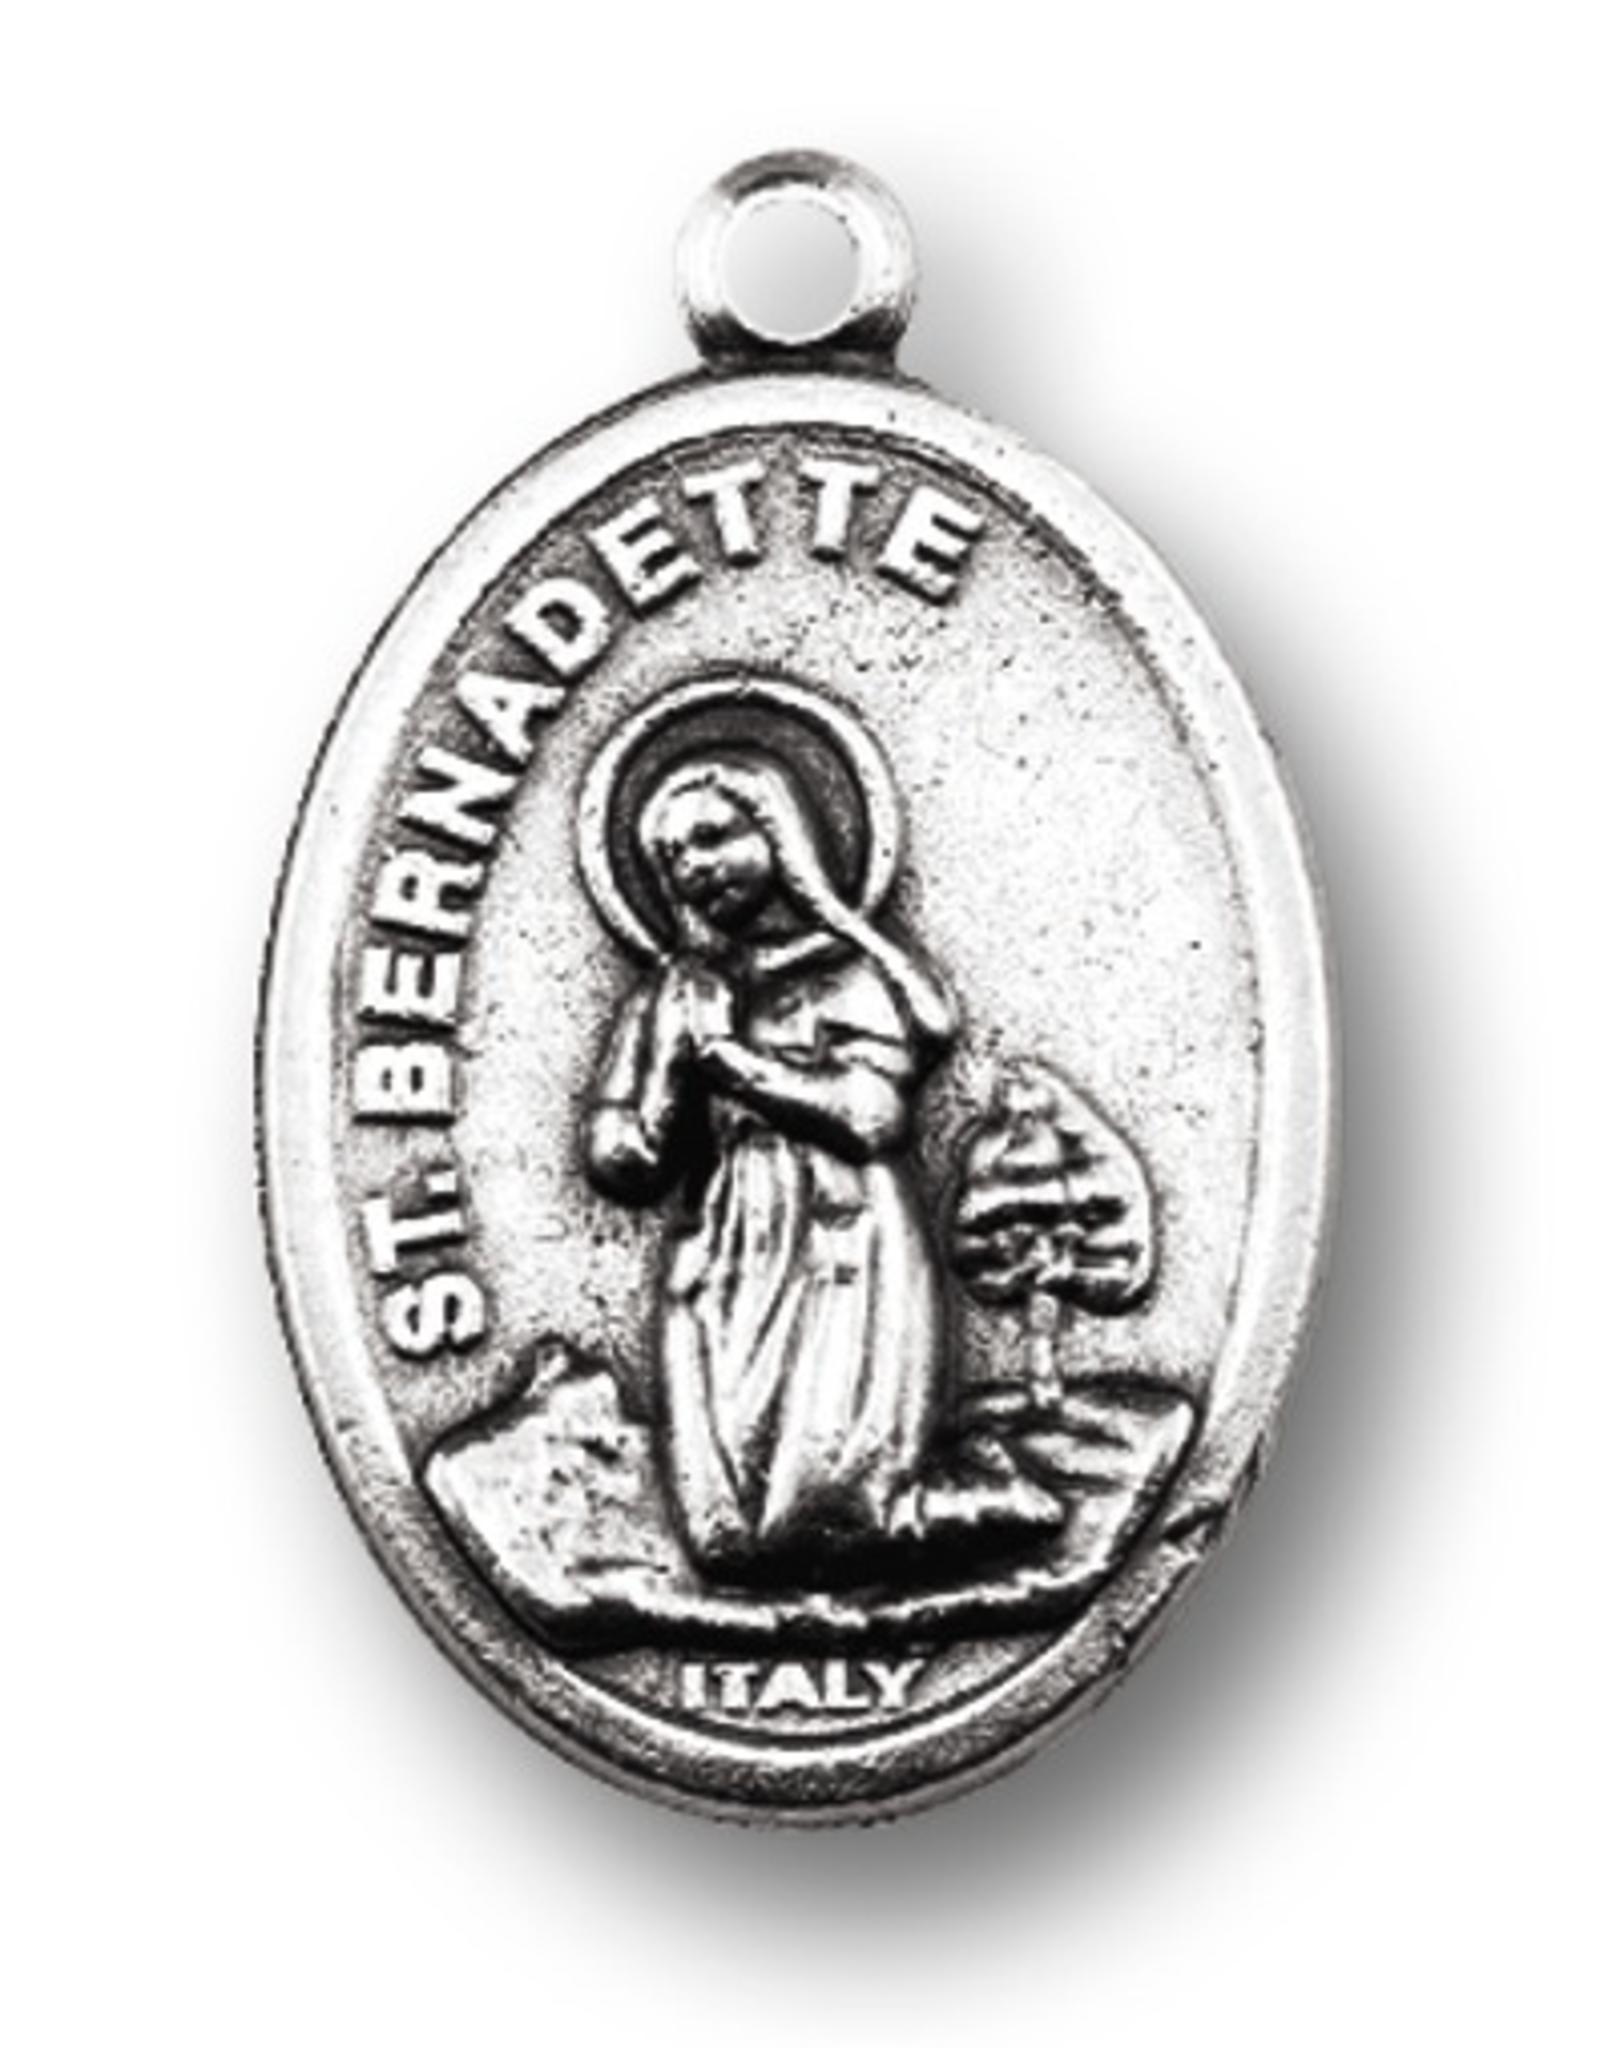 WJ Hirten Our Lady of Lourdes / St. Bernadette Medal